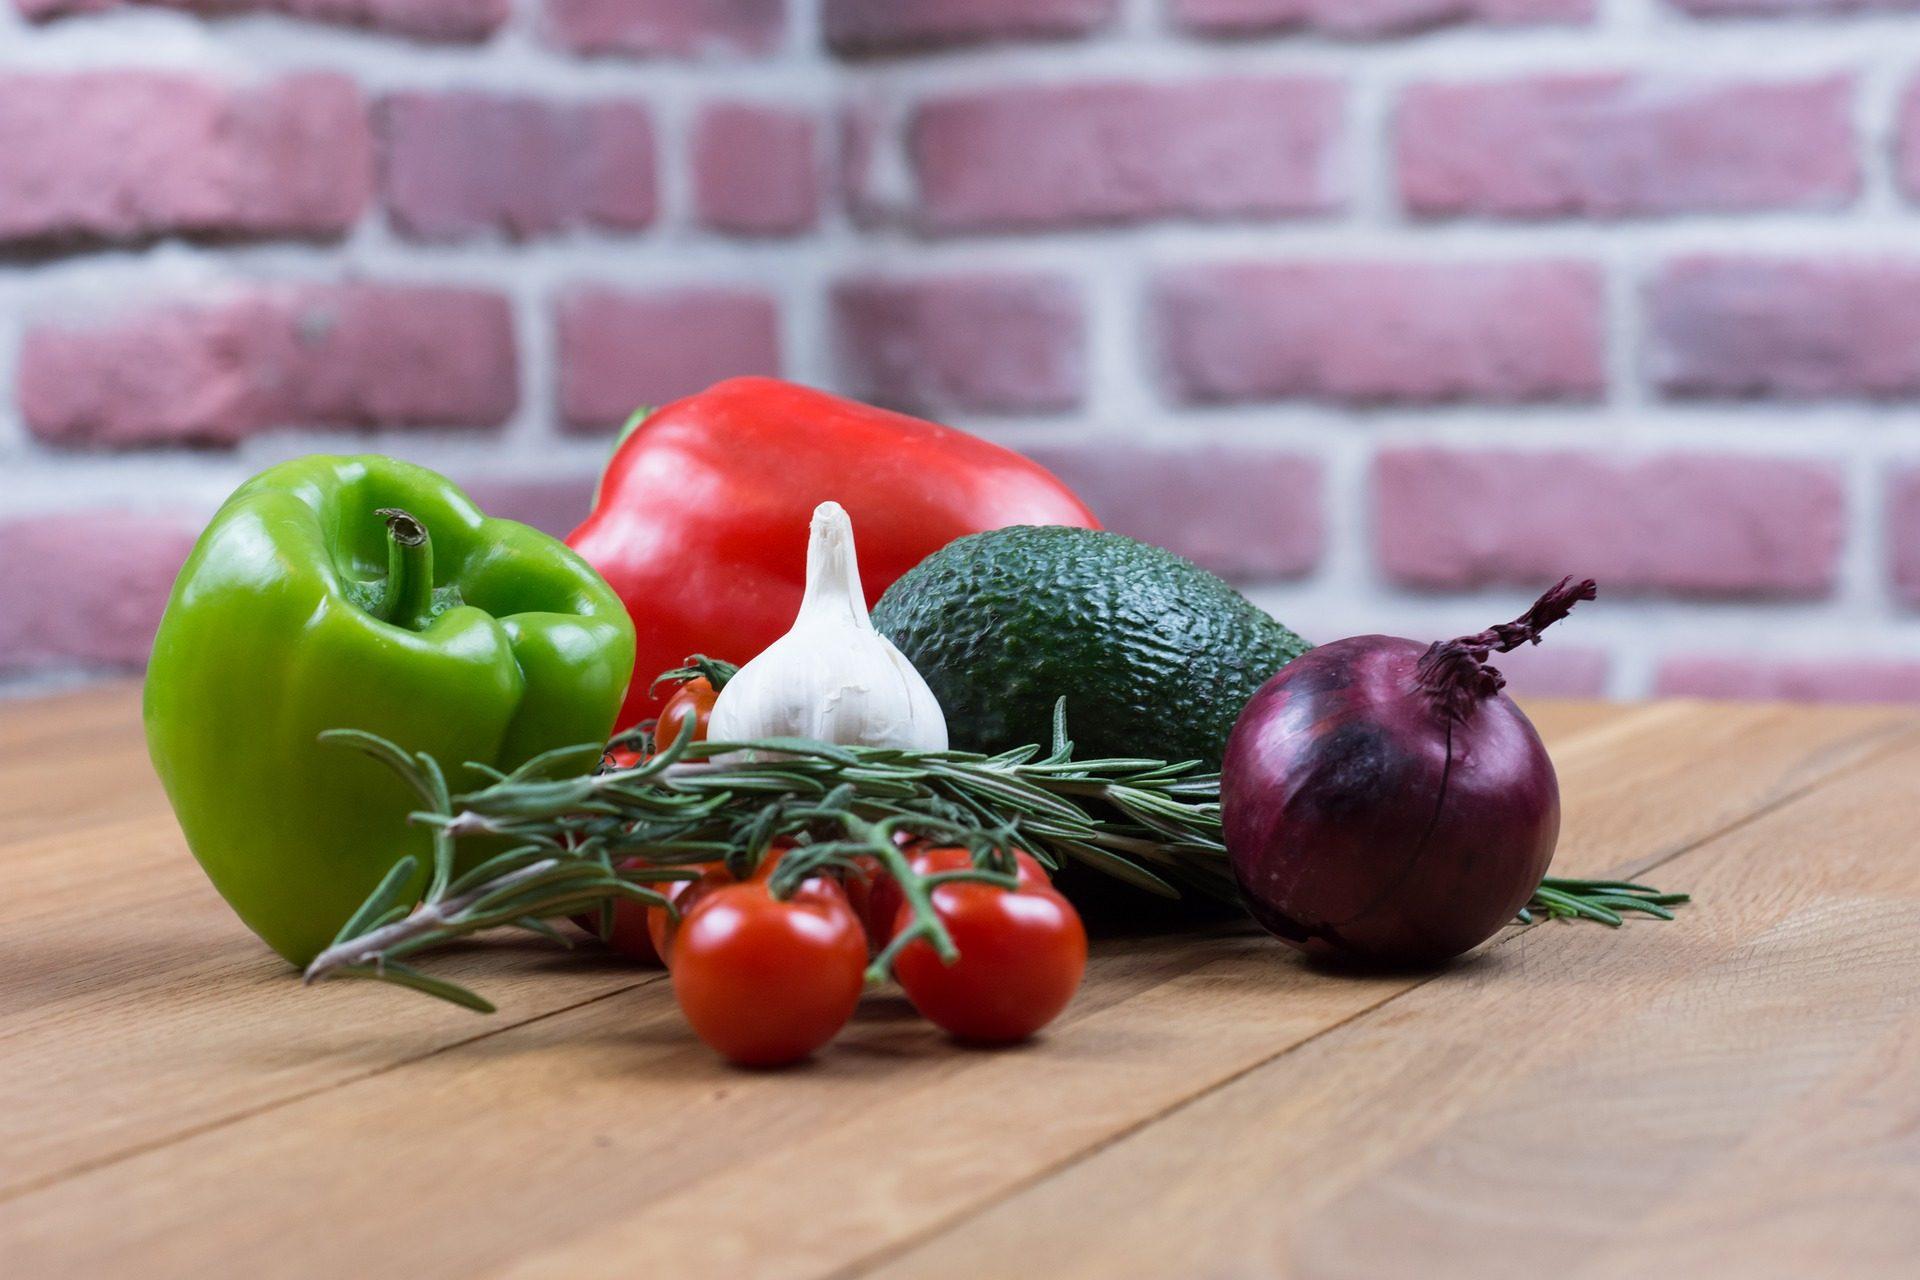 verduras, الخضروات, فلفل, اﻷفوكادو, بصل, الطماطم - خلفيات عالية الدقة - أستاذ falken.com